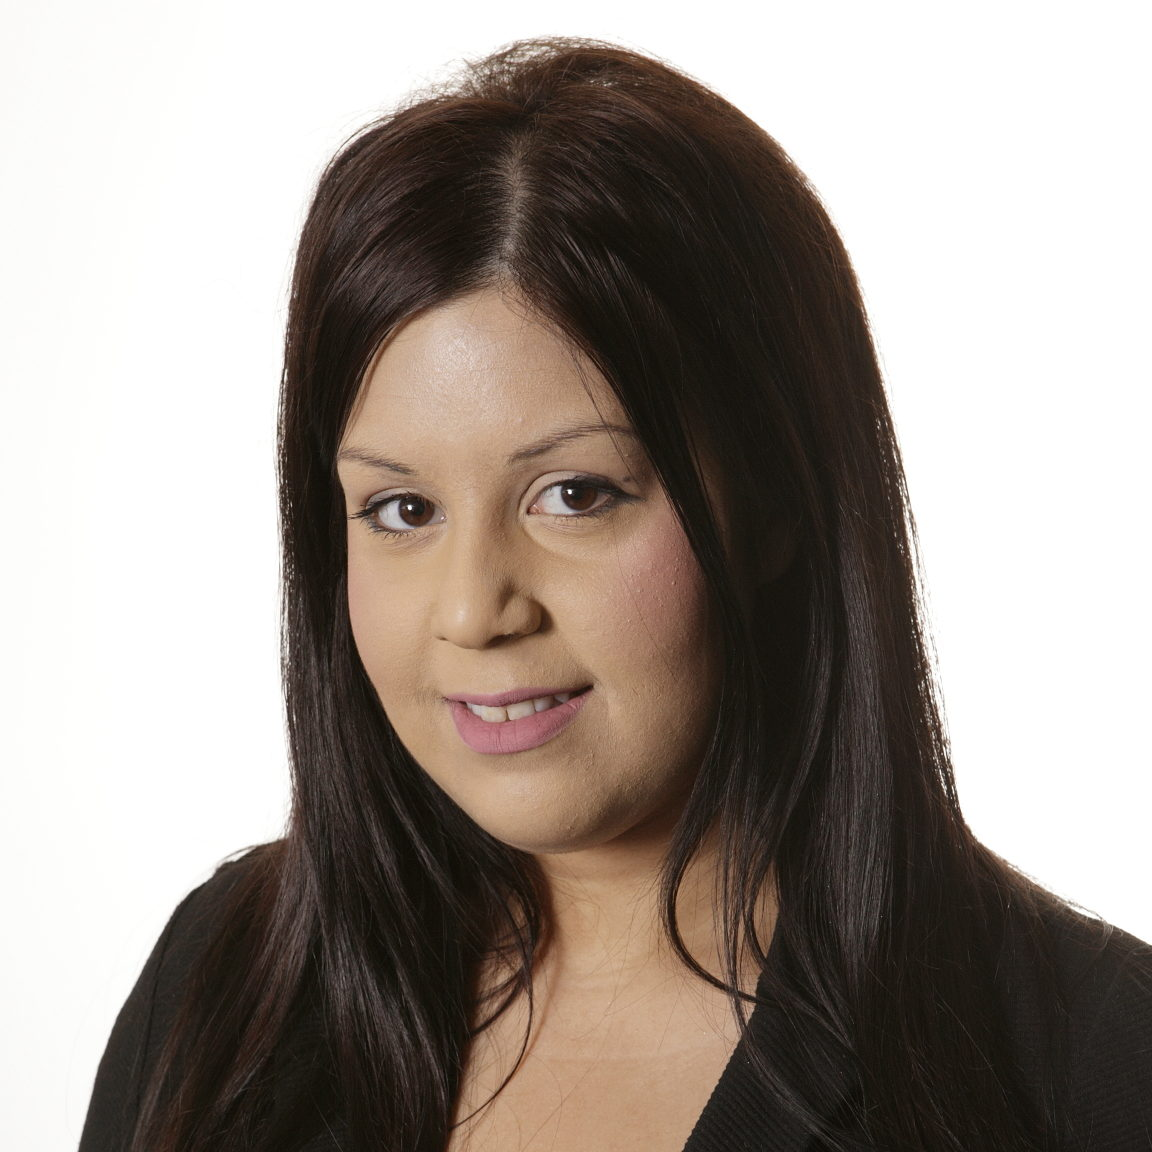 Nadia Choudhury